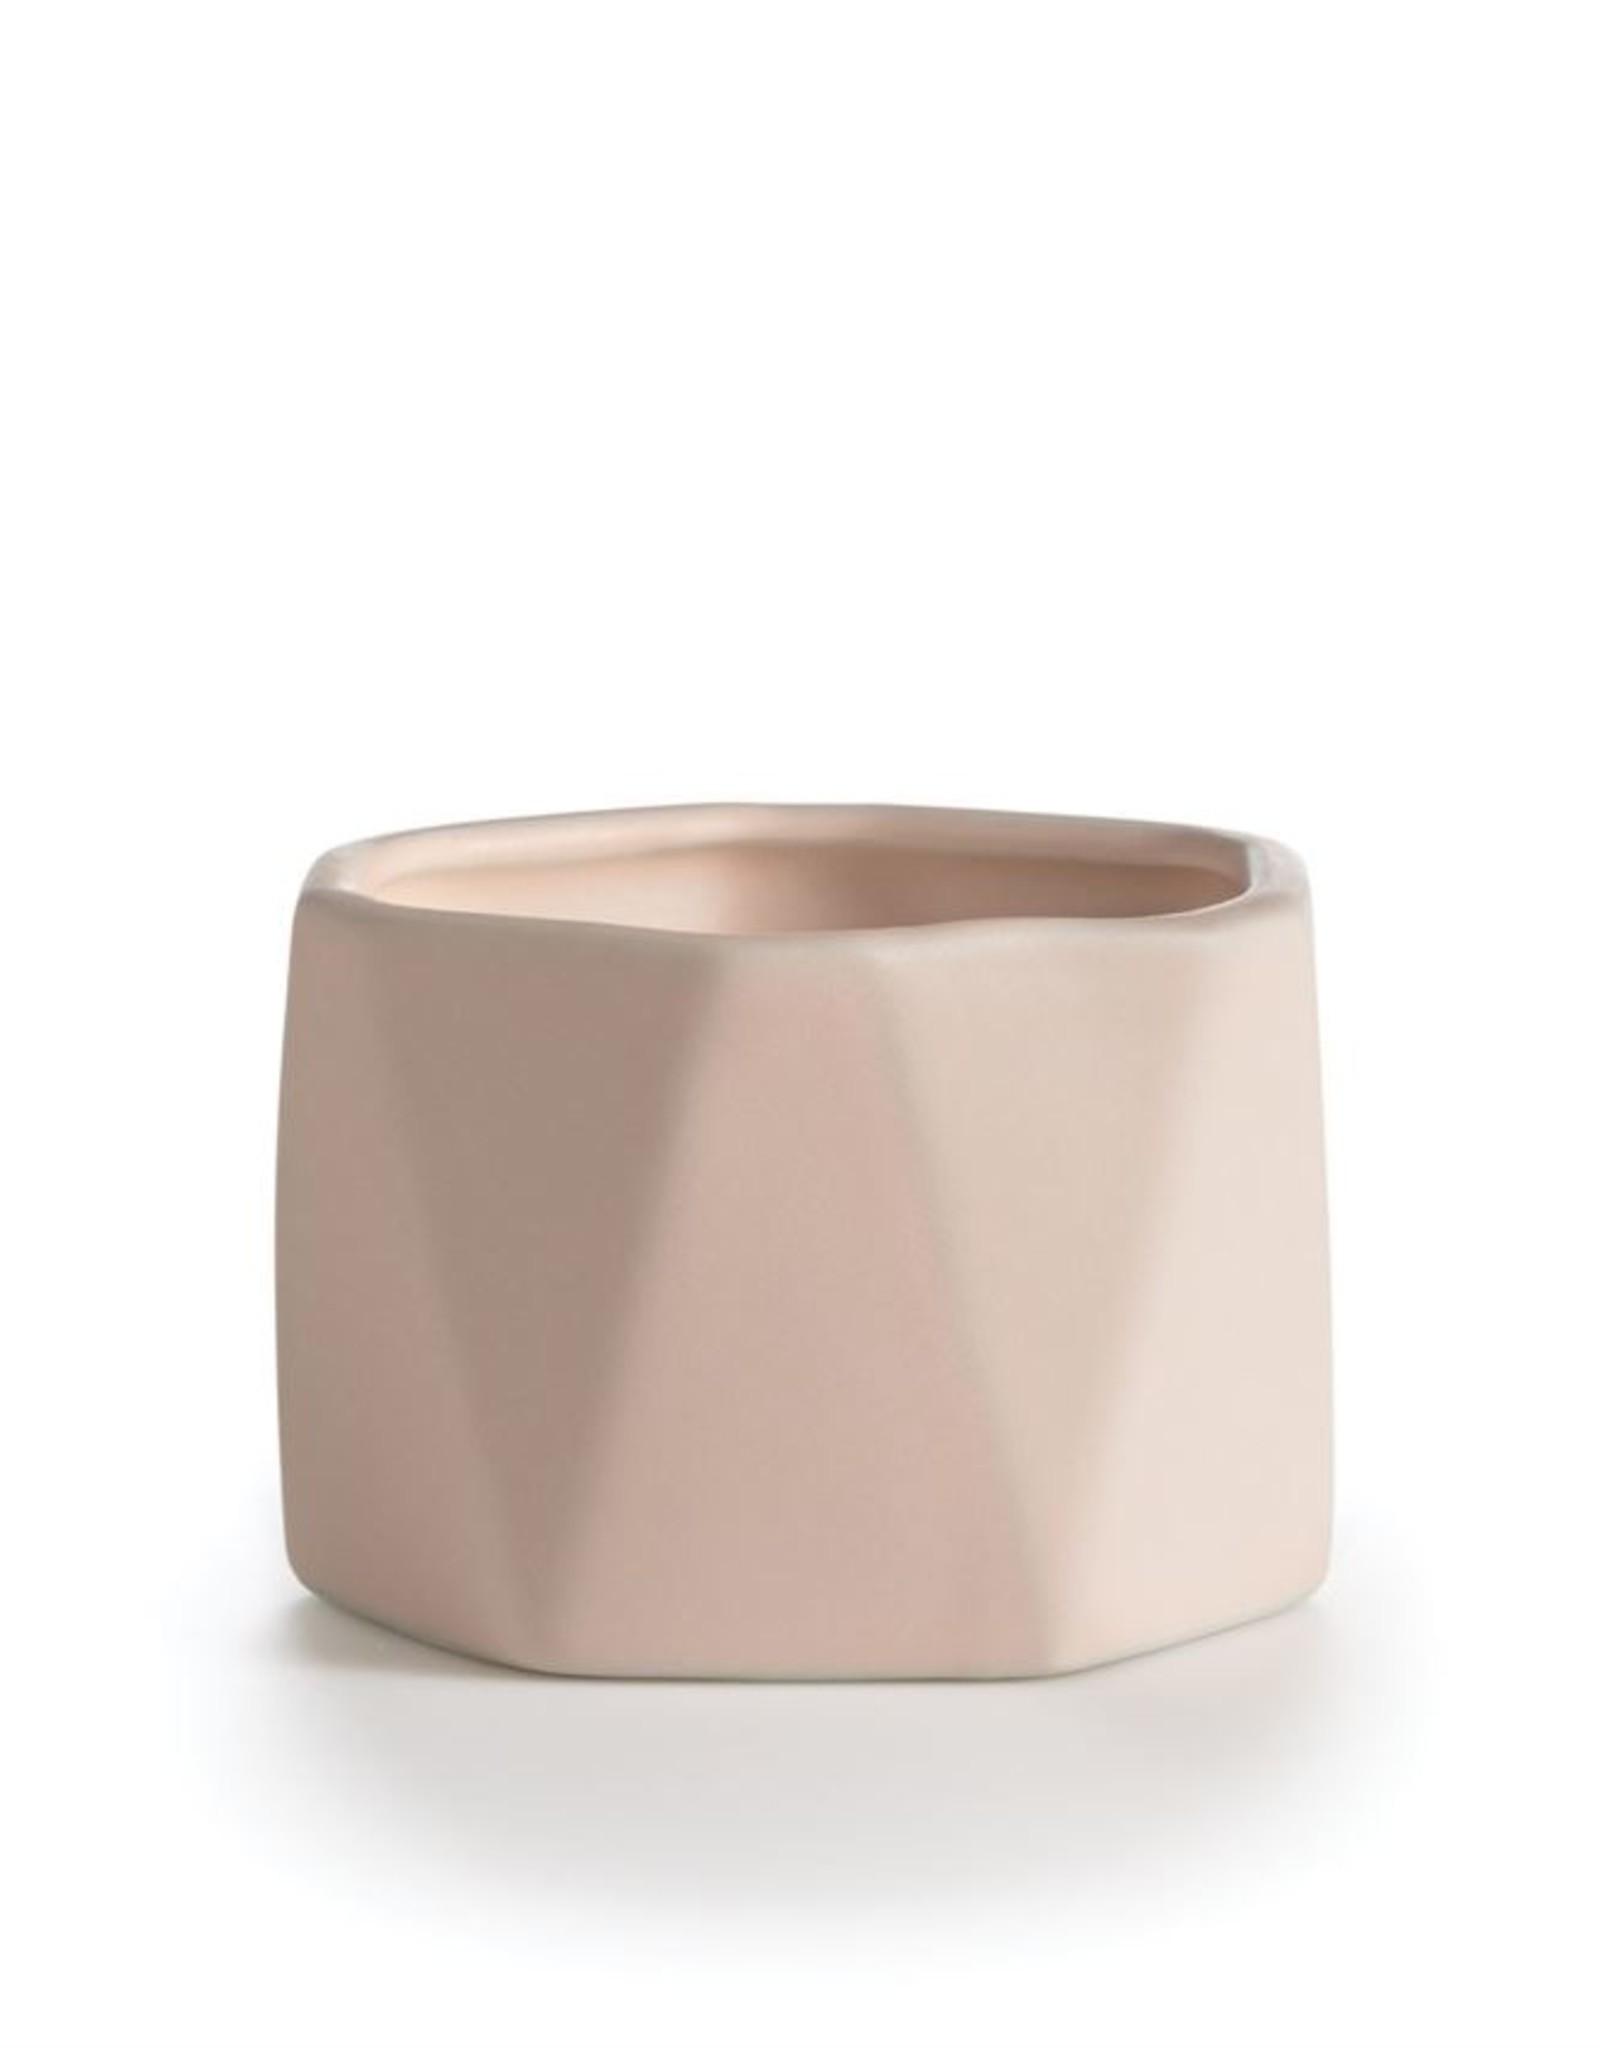 Illume Coconut Milk Mango Dylan Ceramic Candle 4.7oz